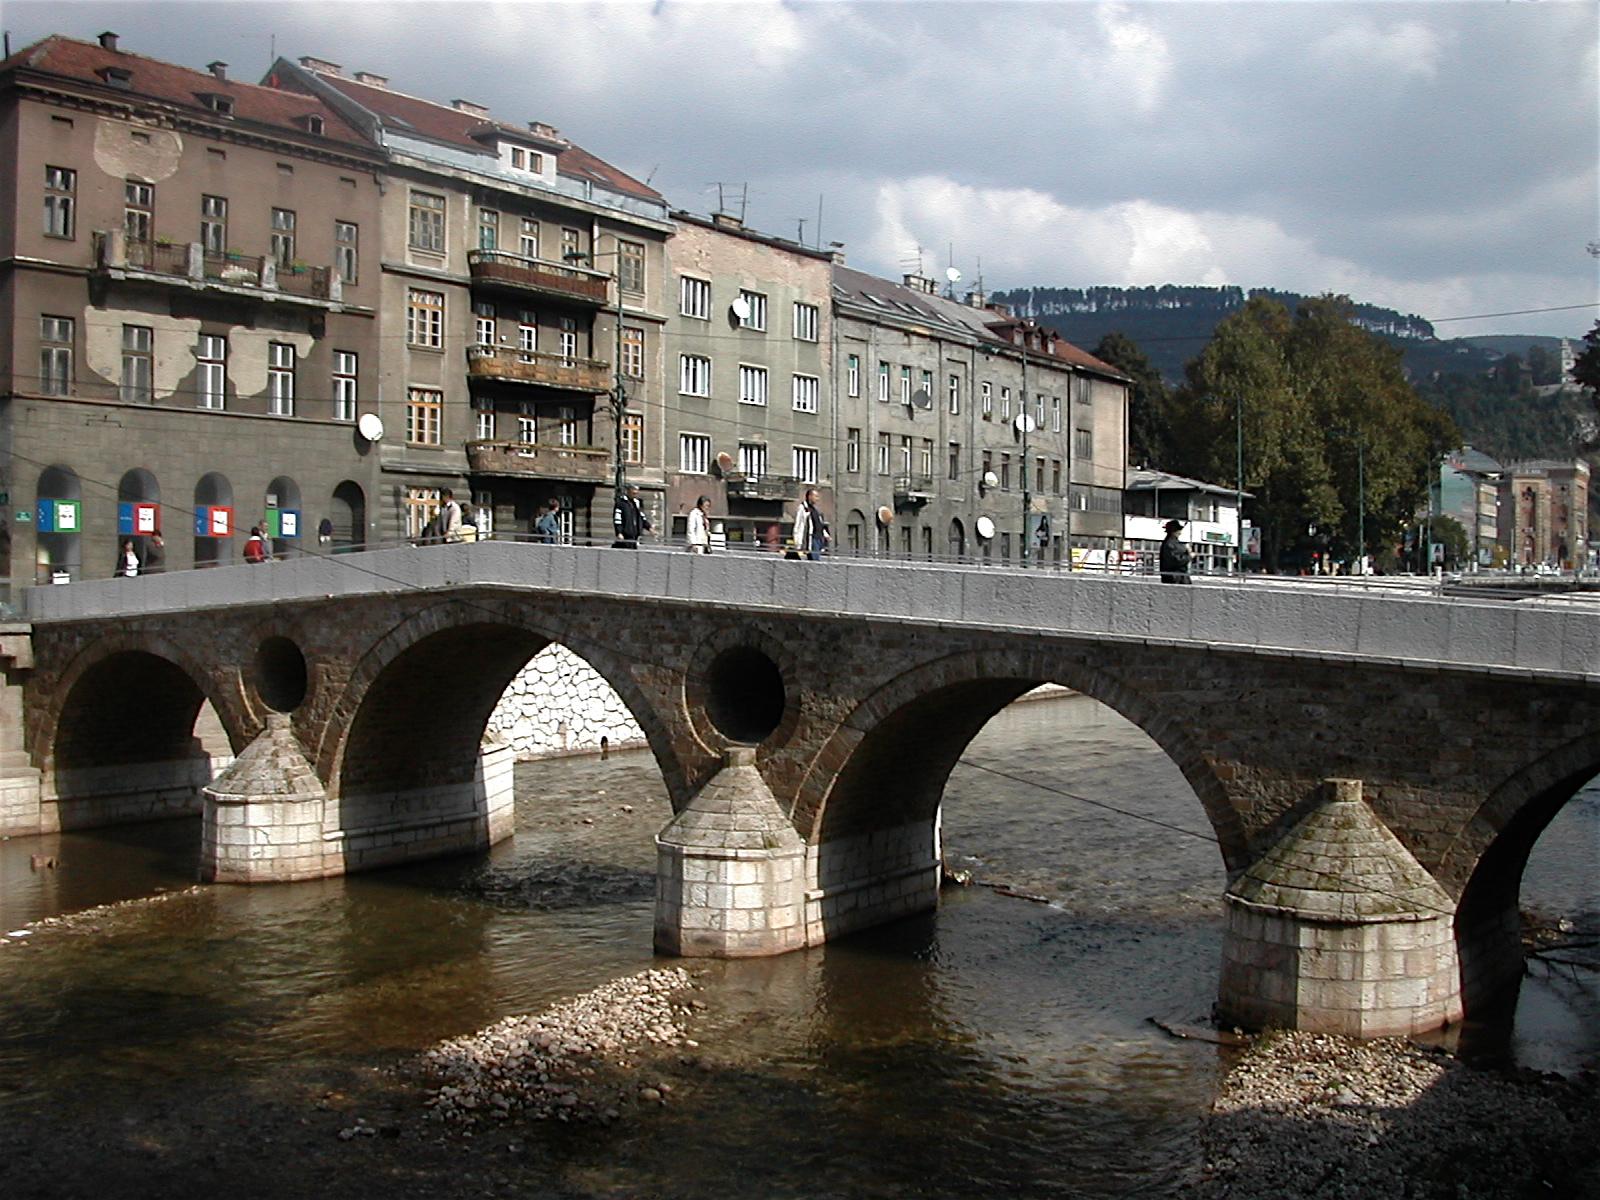 The Latin Bridge near the assassination site